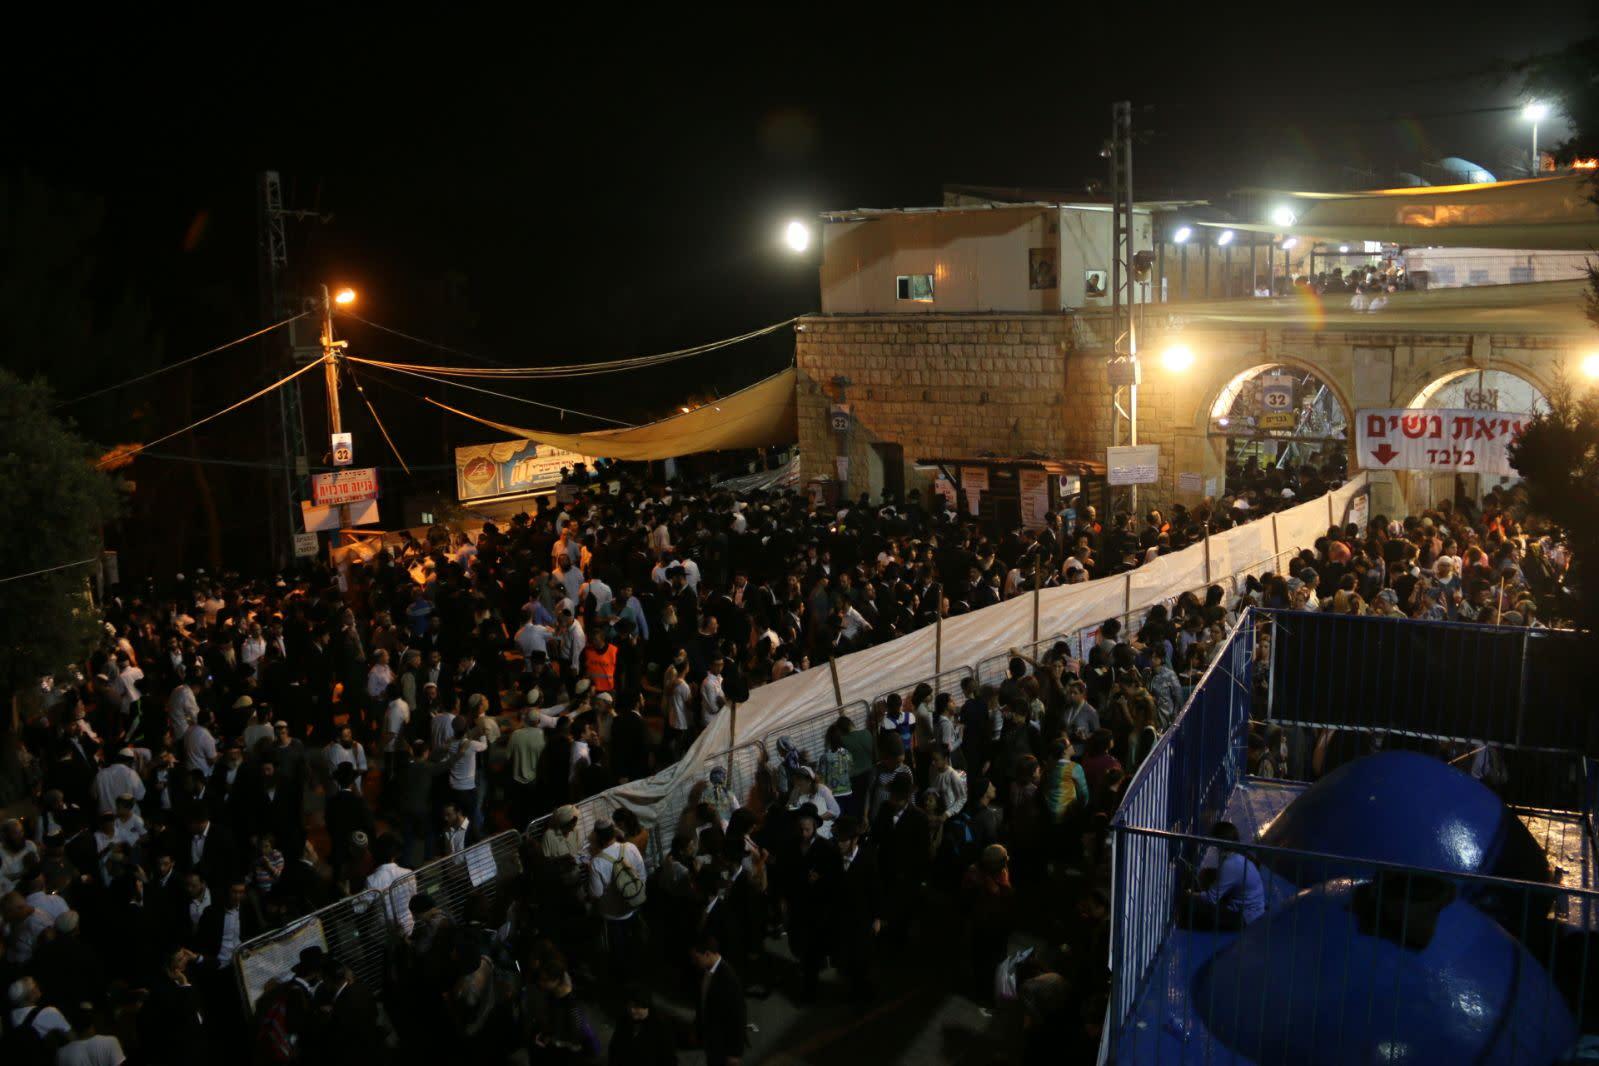 Thousands celebrate Lag BaOmer at the tomb of the Rashbi (Shimon bar Yochai) in the northern Israeli city of Meron (EITAN SHWEIBER/TPS)